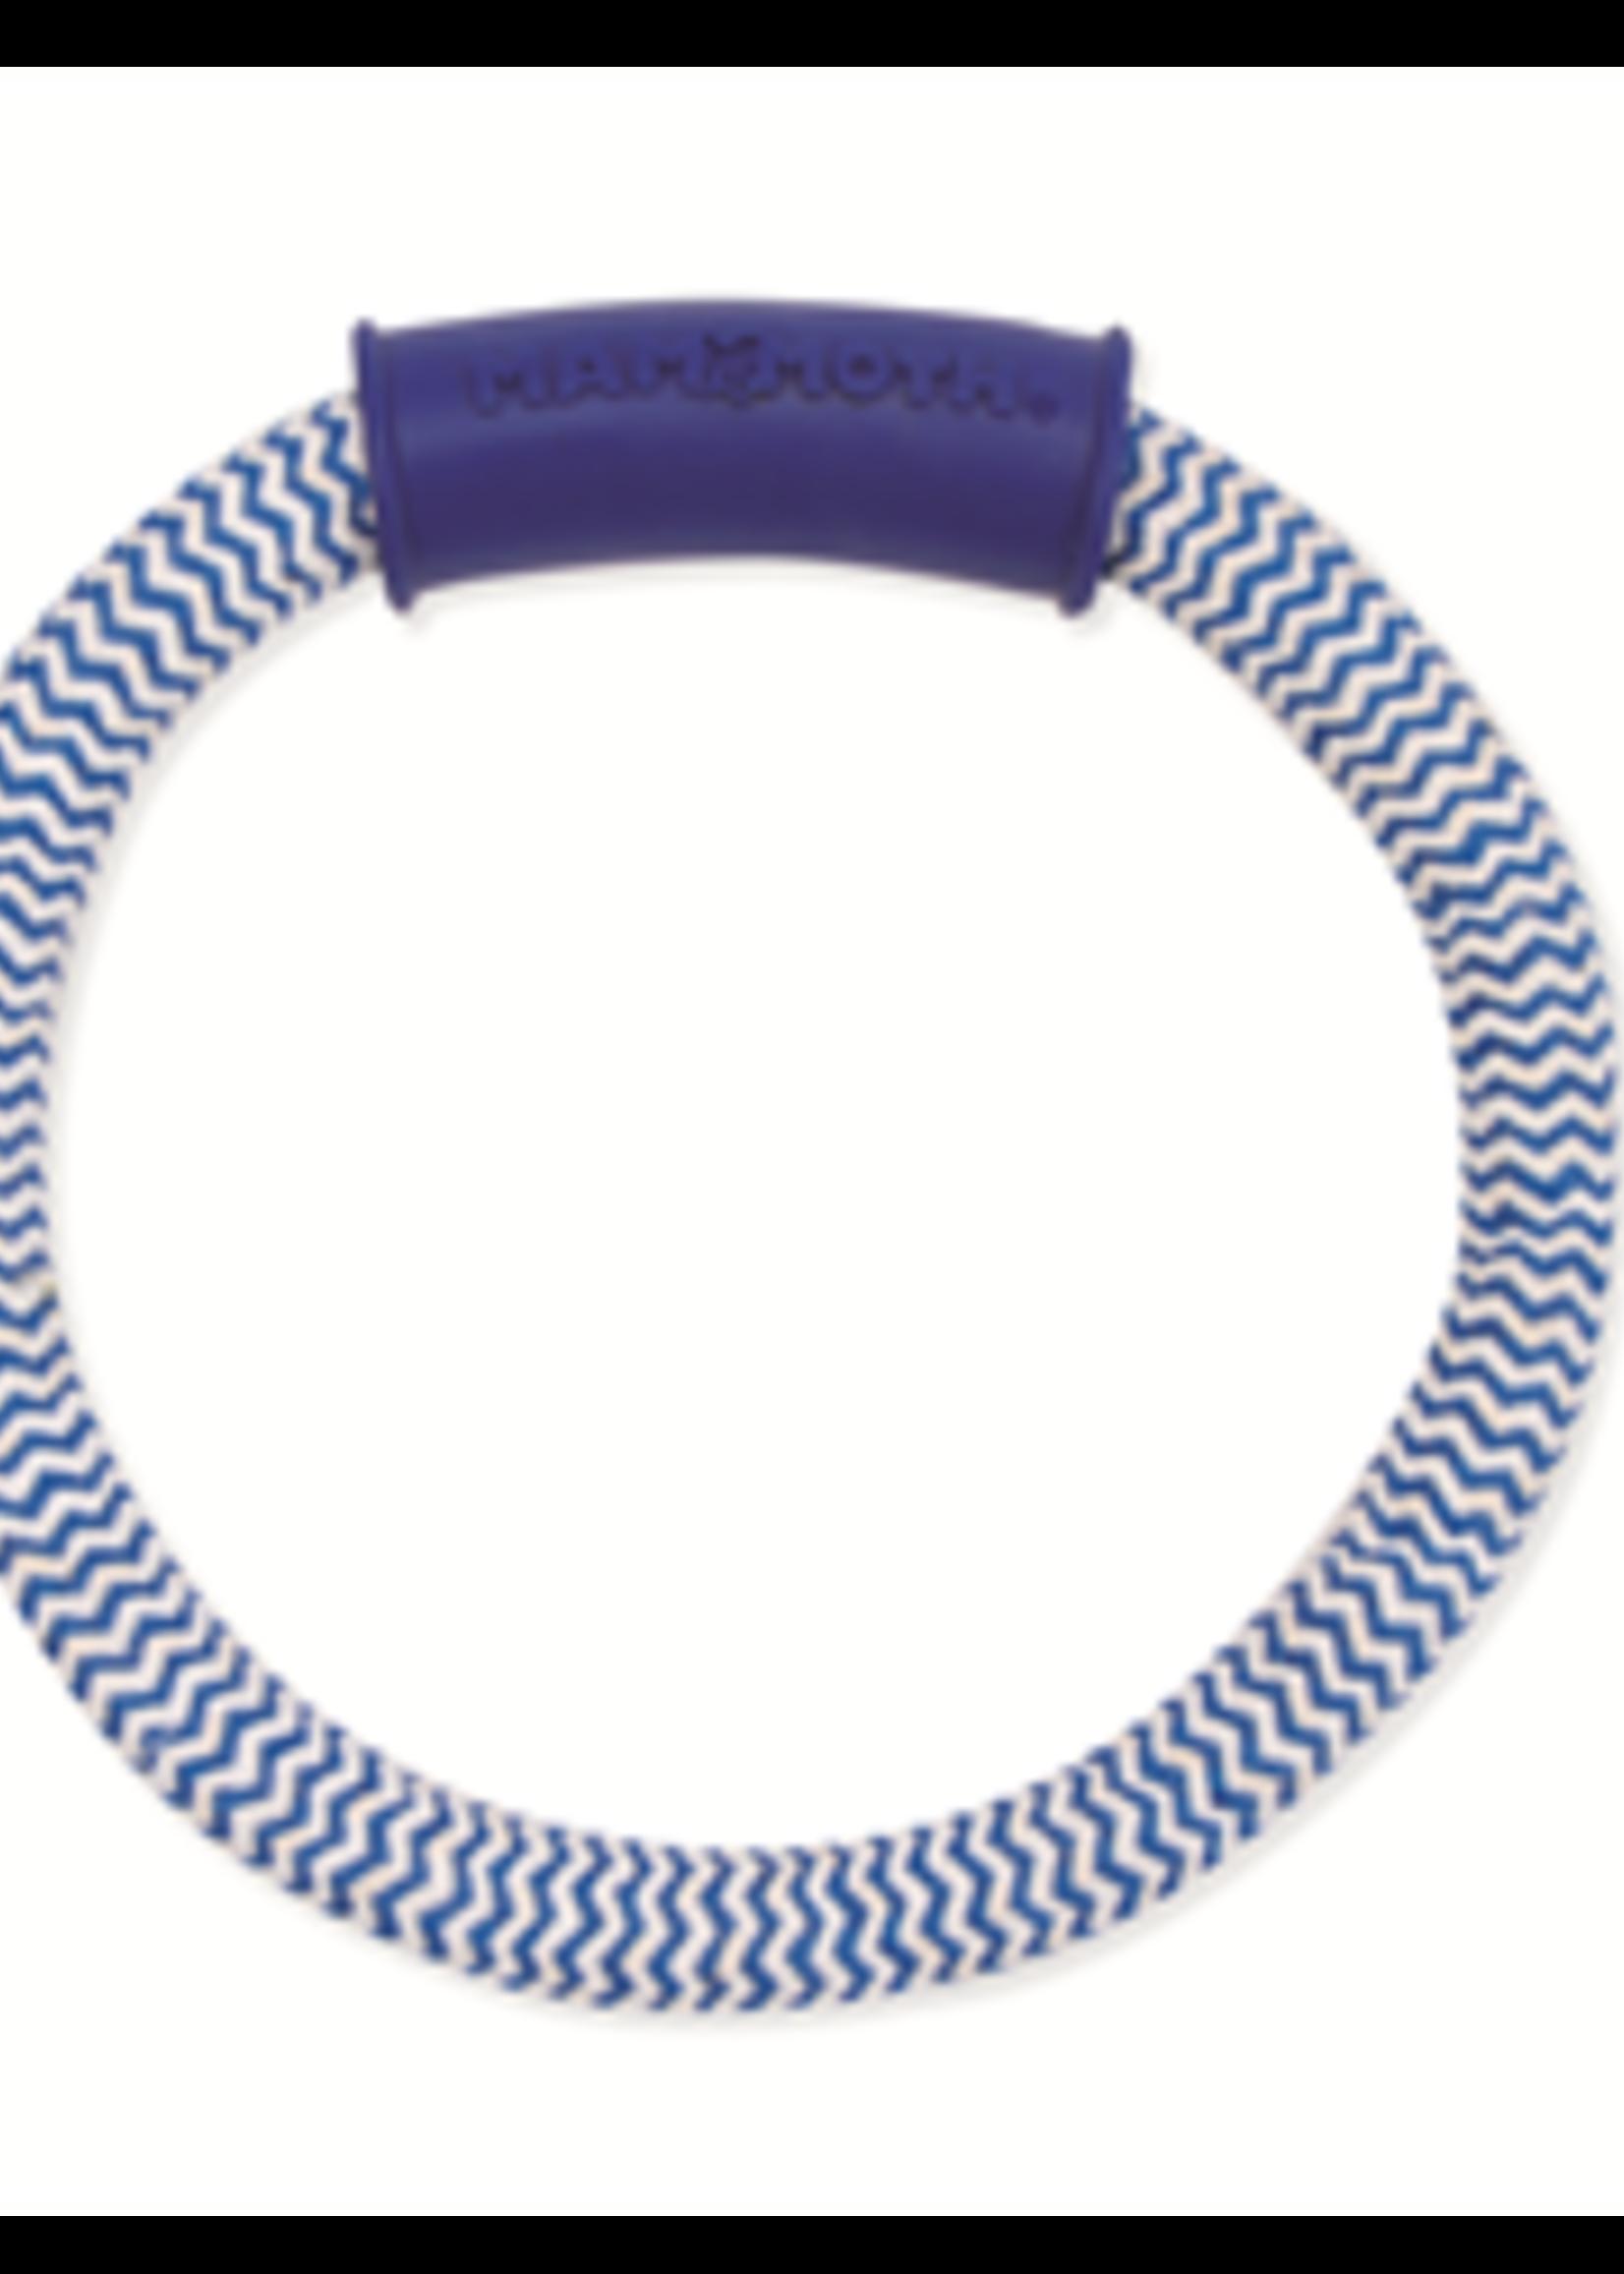 Mammoth® Mammoth® Flossy Chews® Extra Fresh™ Ring with Handle - Medium